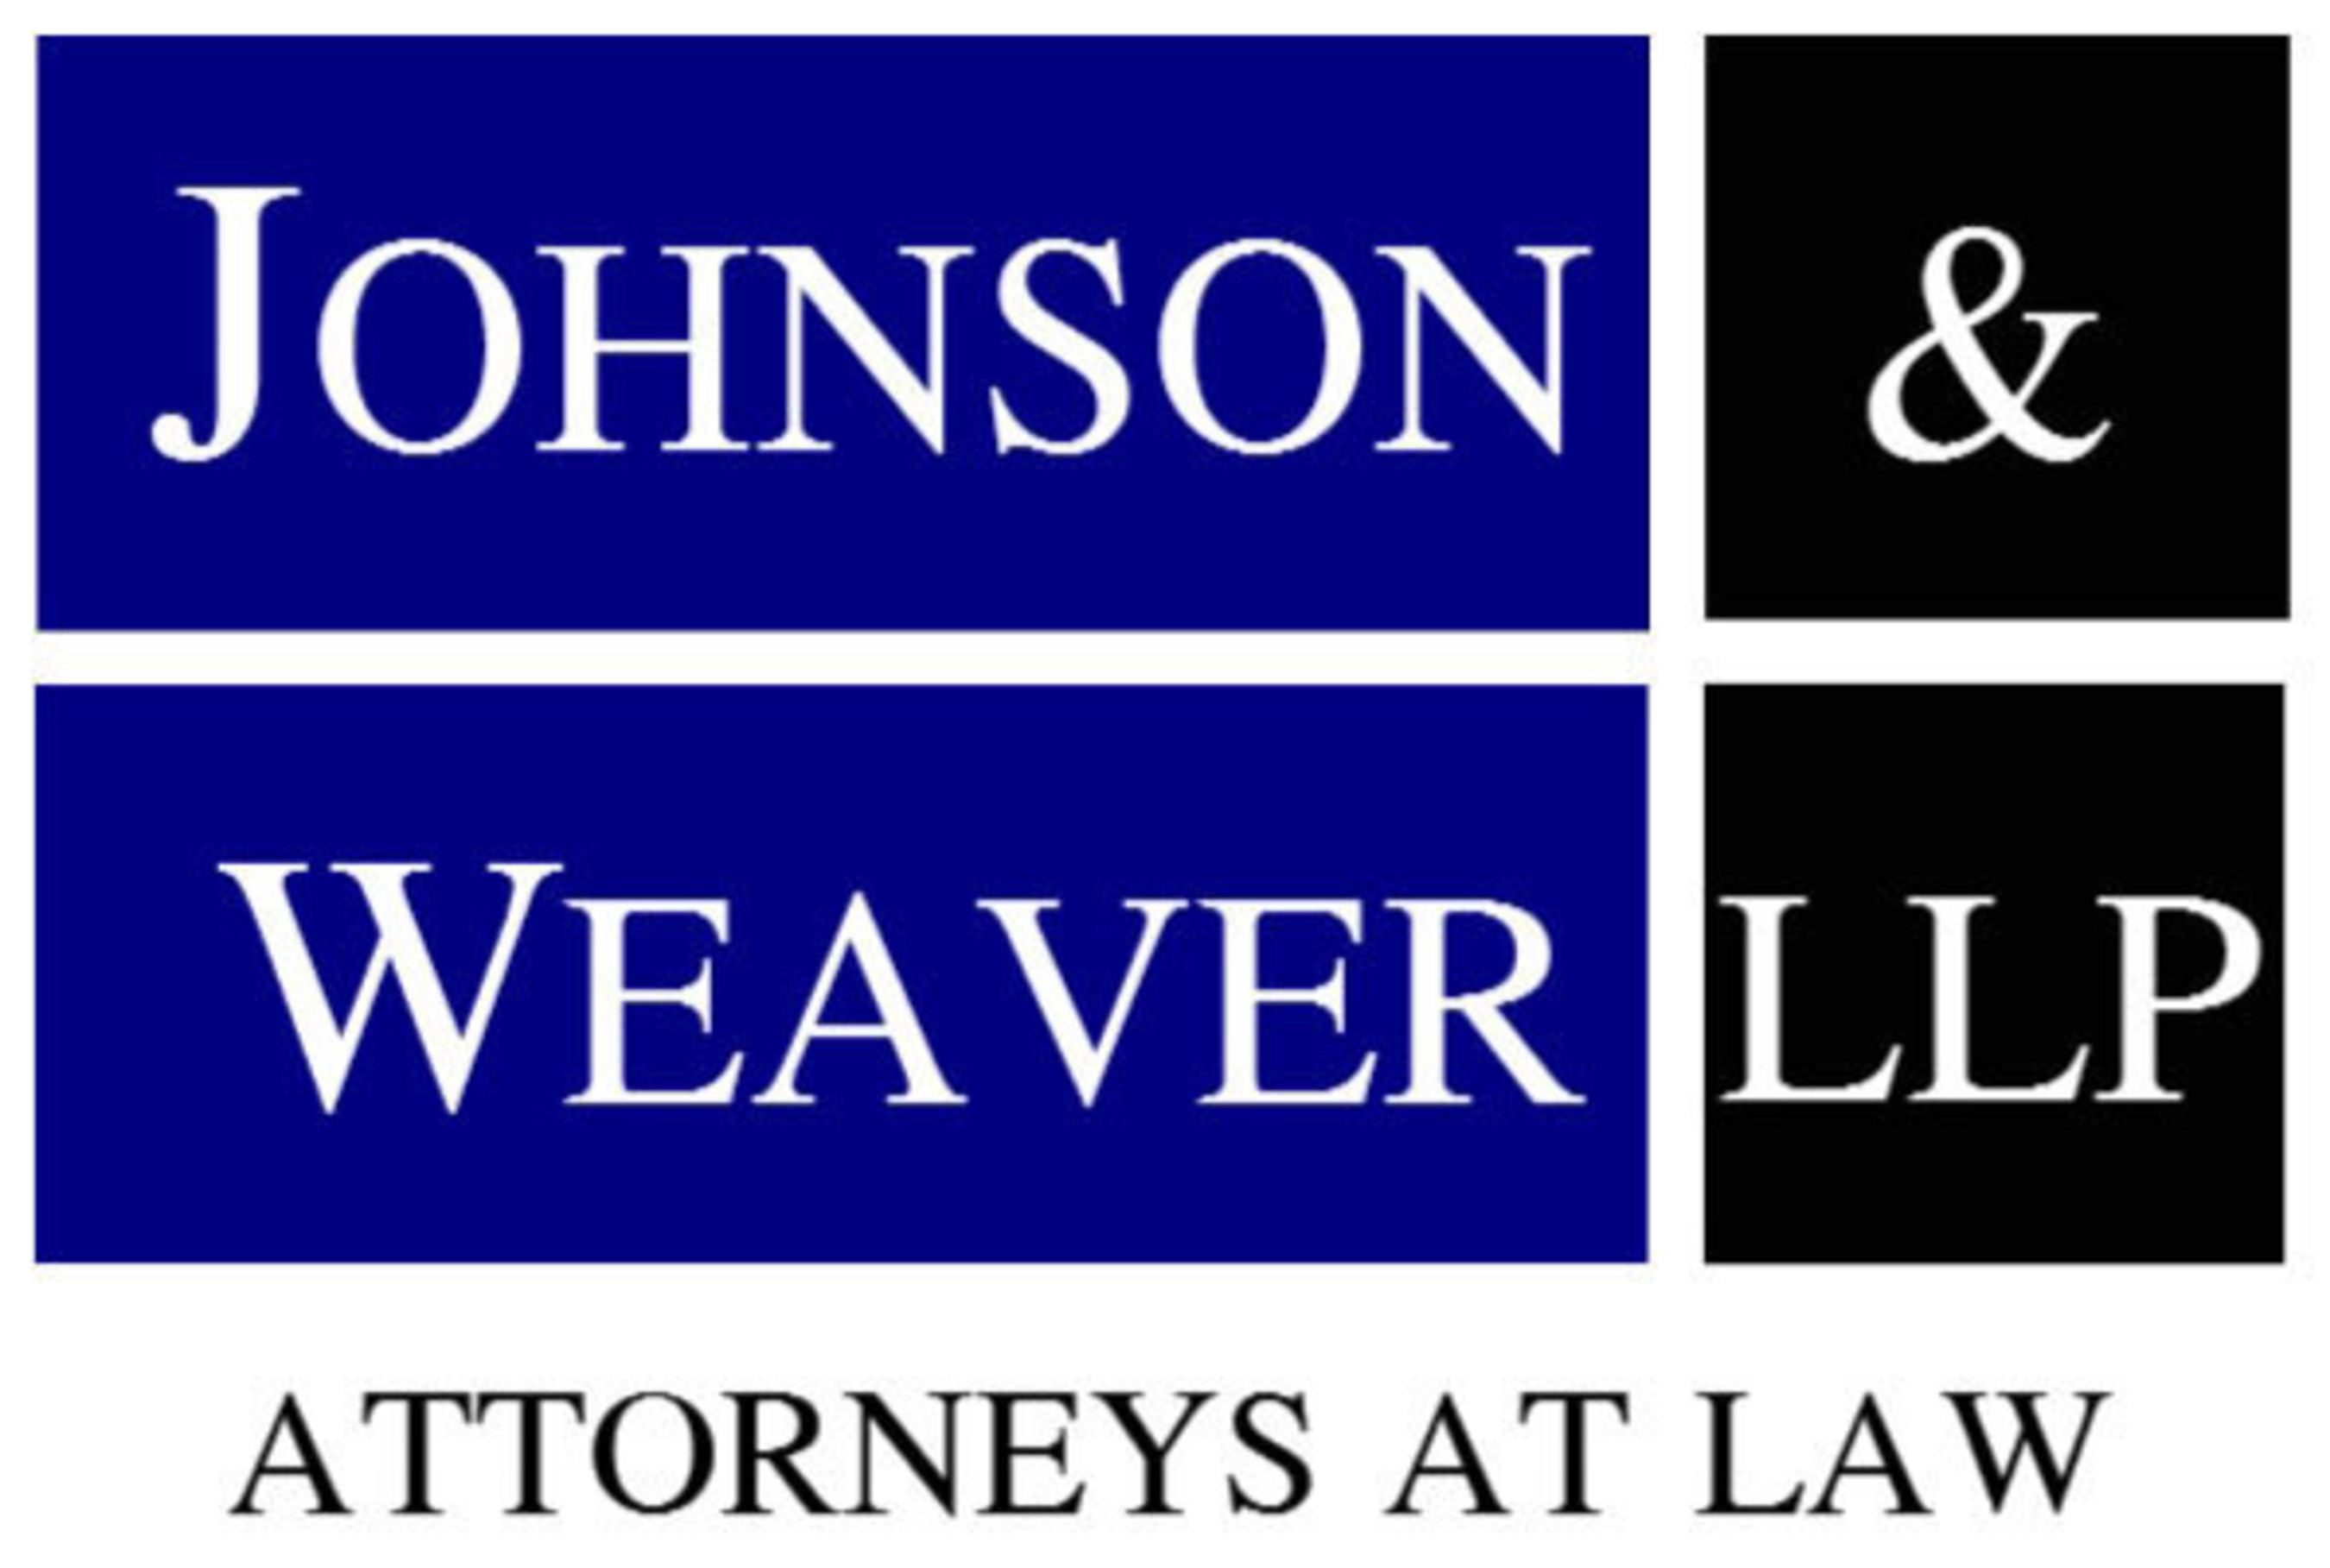 Johnson & Weaver LLP